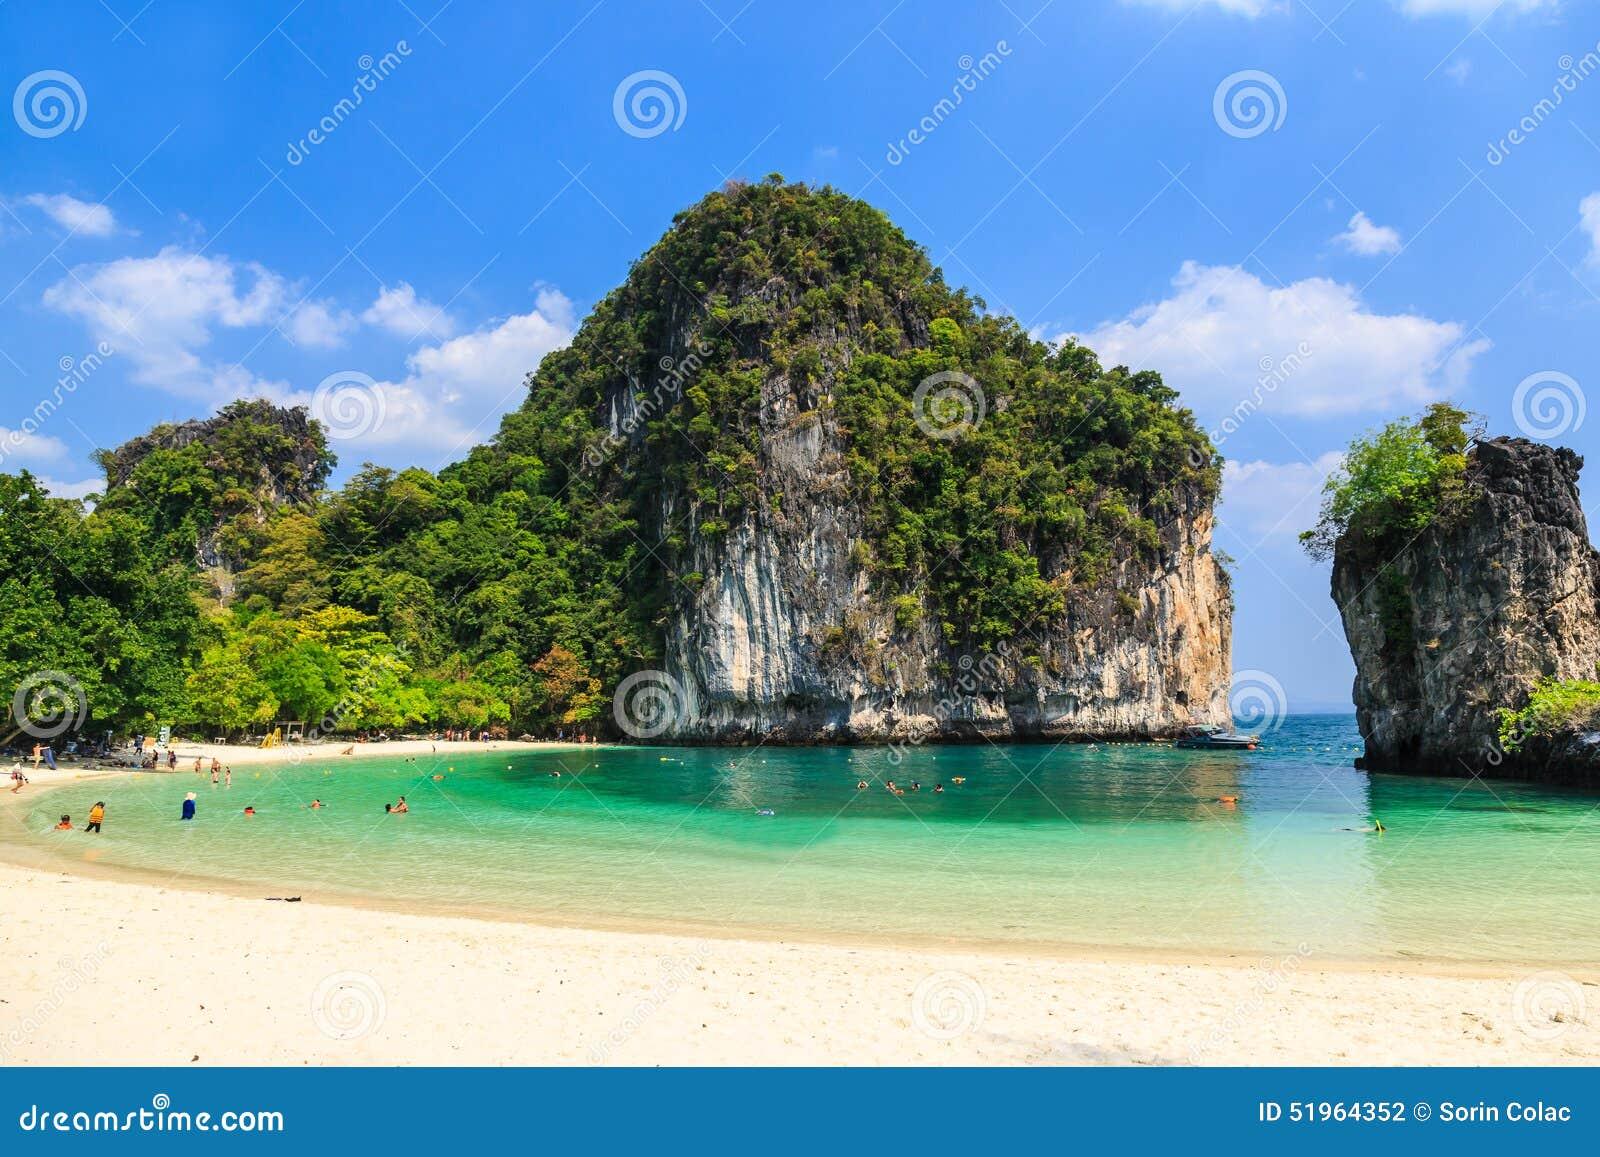 Hong Islands, Thailand Stock Photo - Image: 51964352